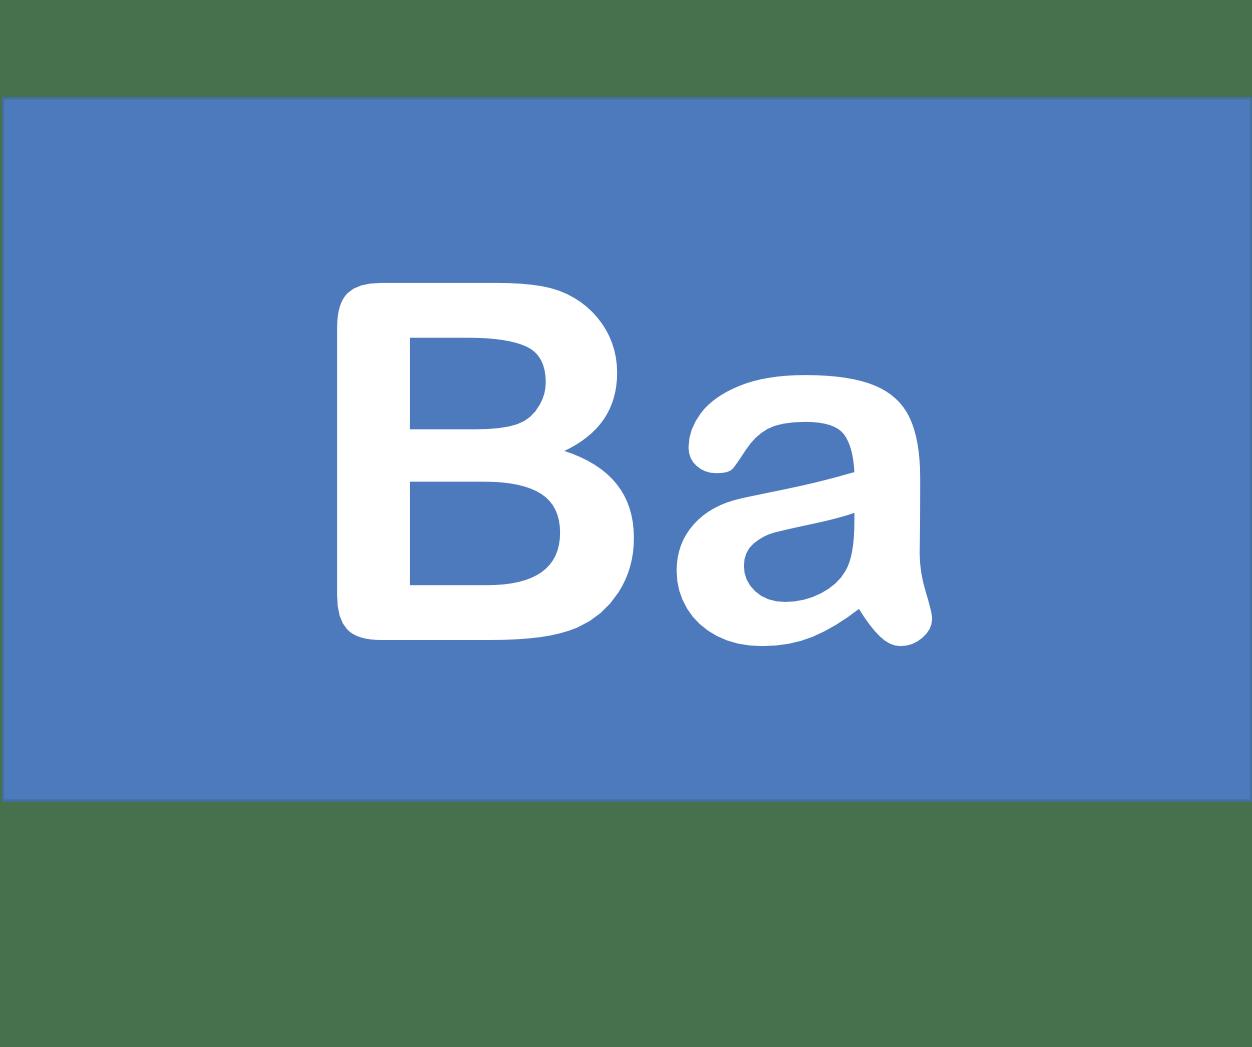 56 Ba バリウム Barium 元素 記号 周期表 化学 原子